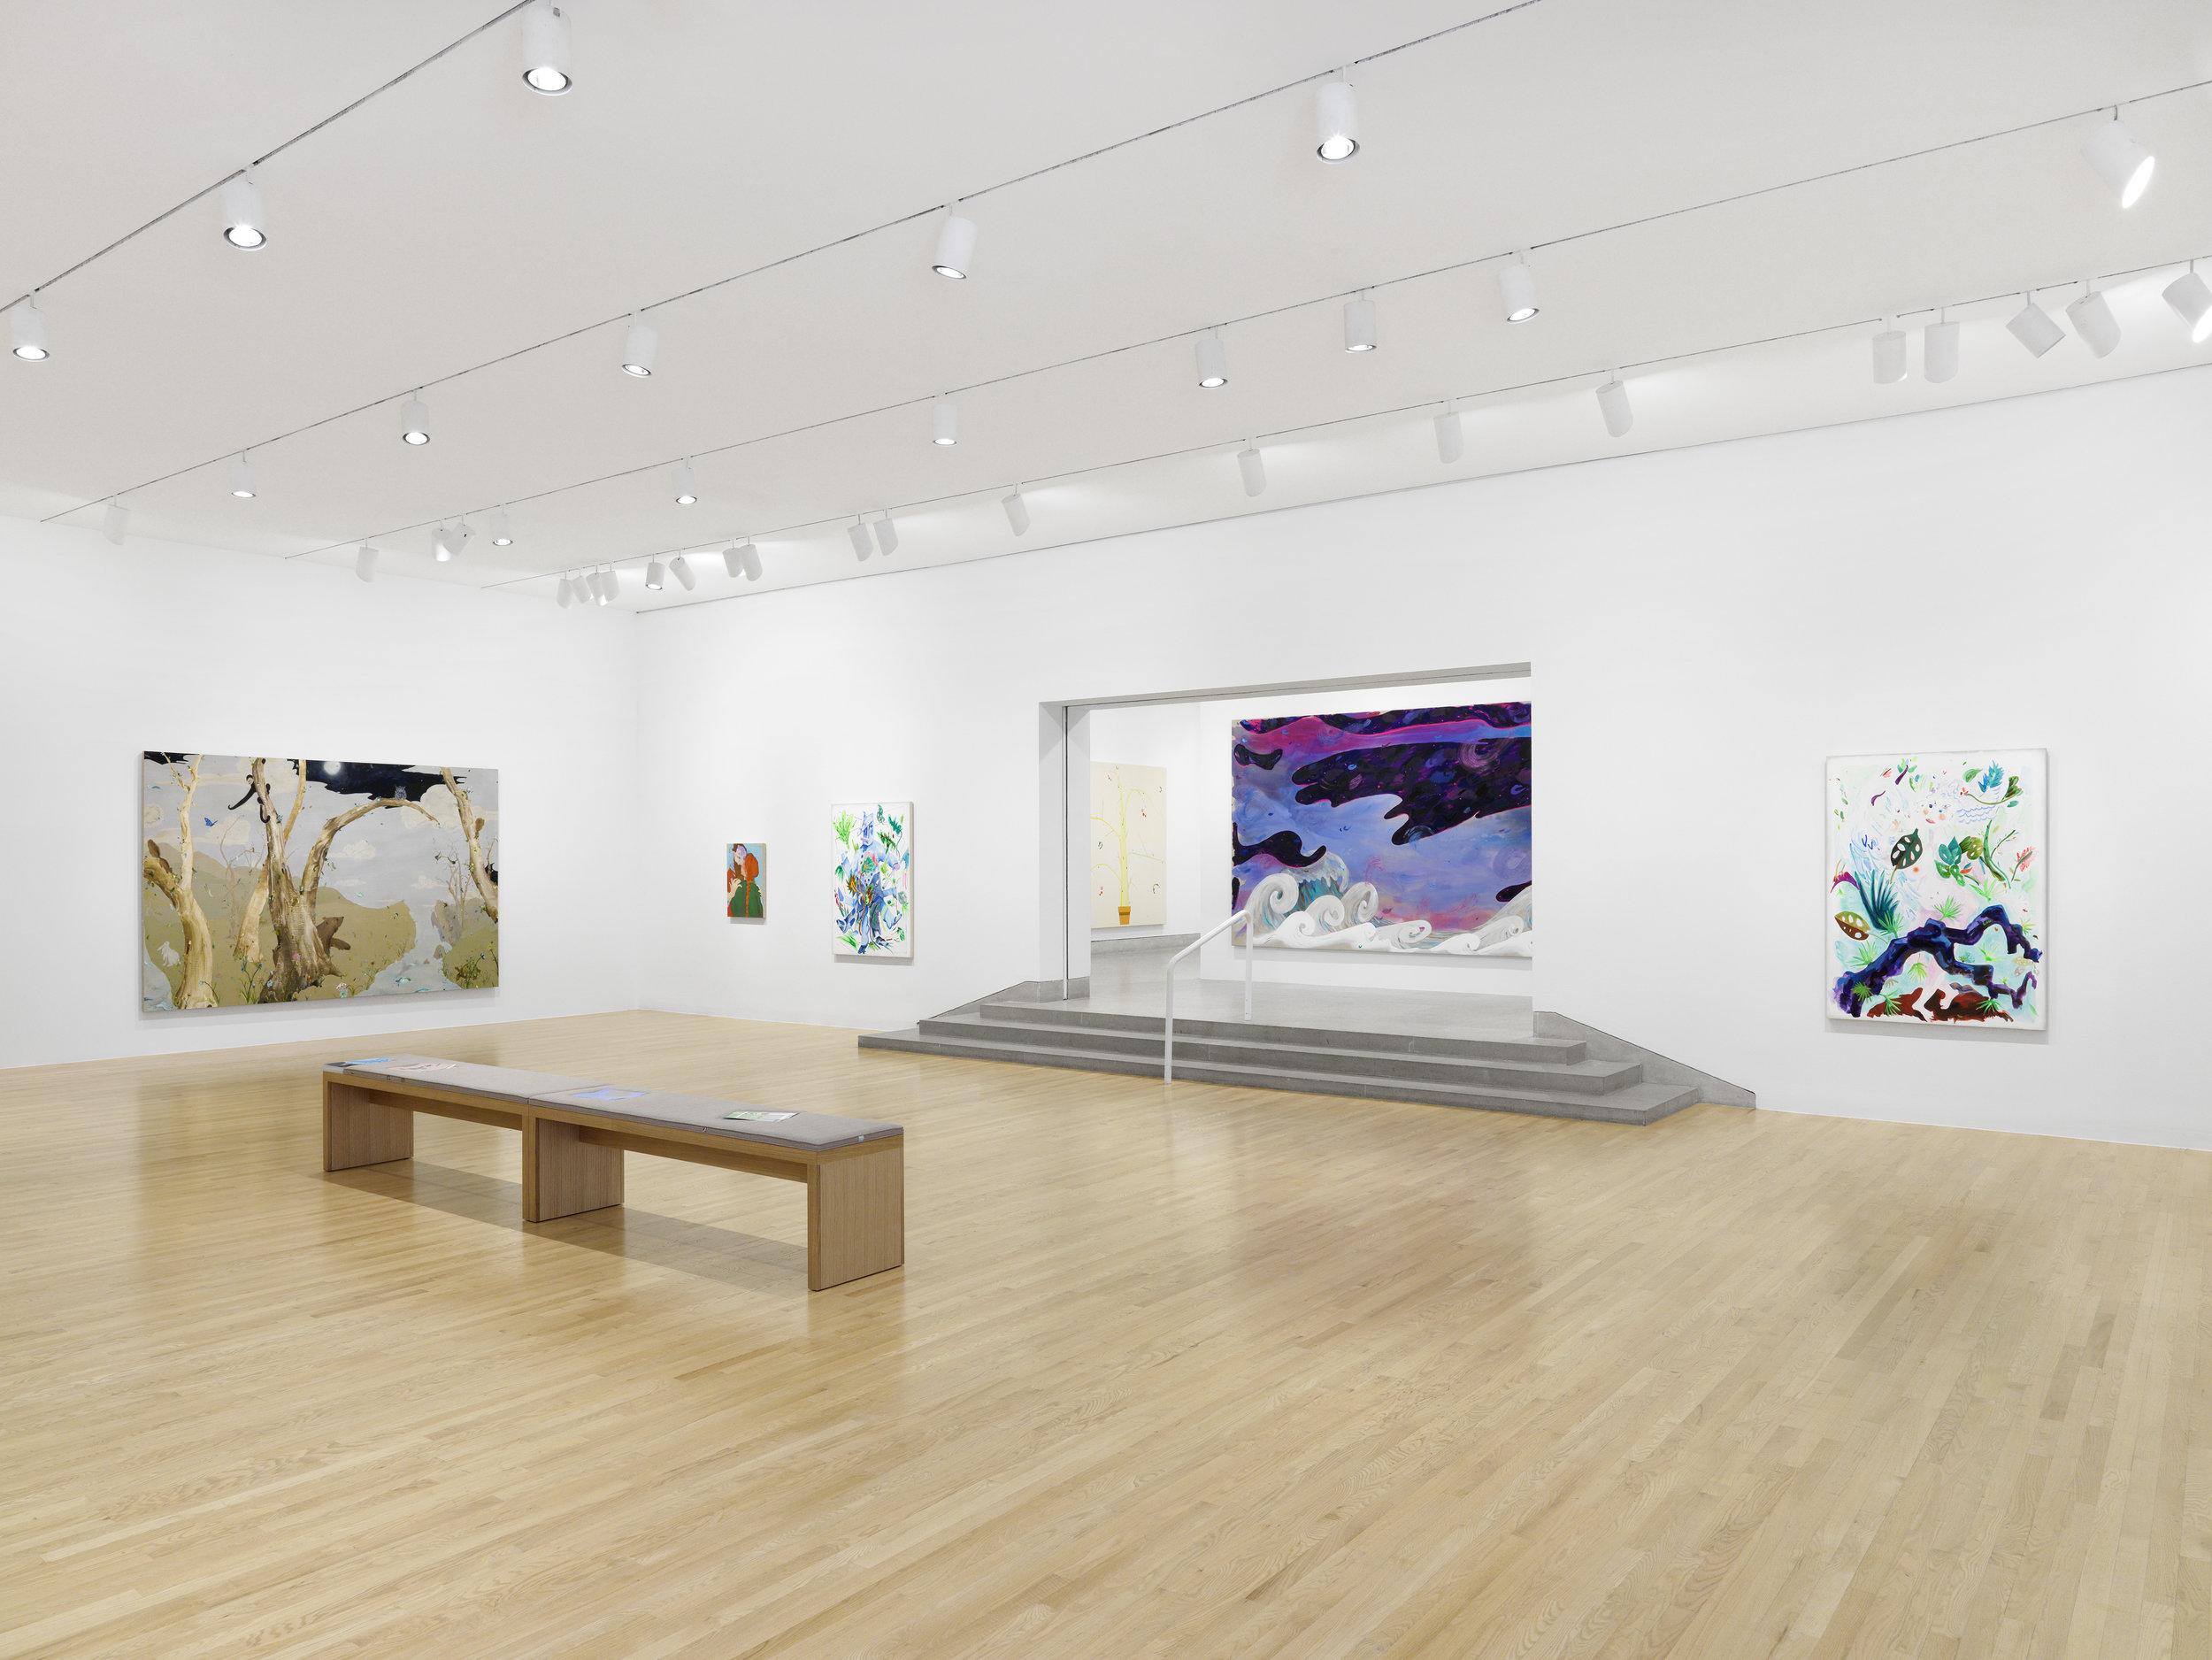 DMA - Dallas Museum of Art - Dallas | Laura Owens | 2018